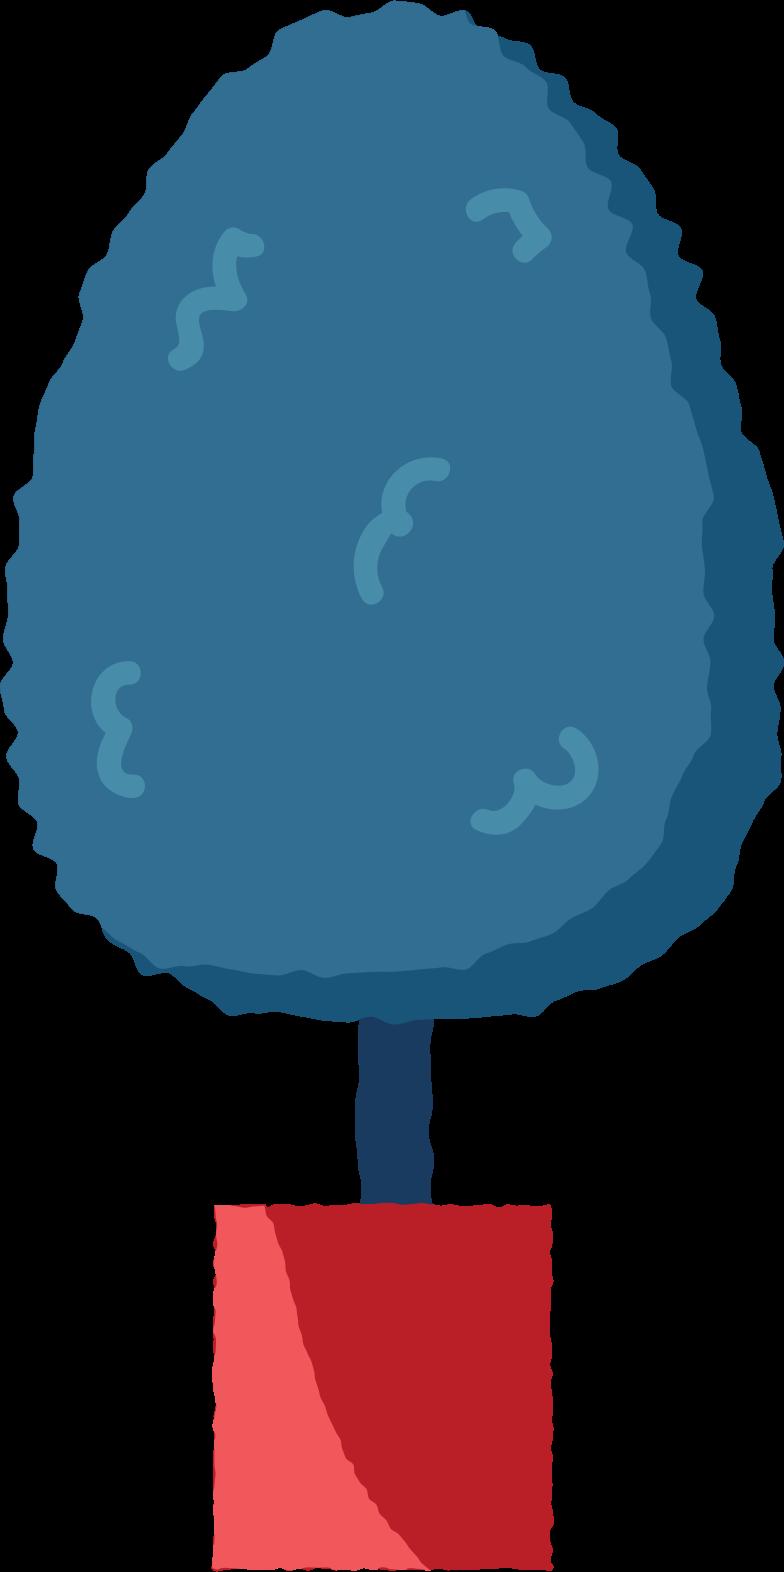 fruit tree Clipart illustration in PNG, SVG